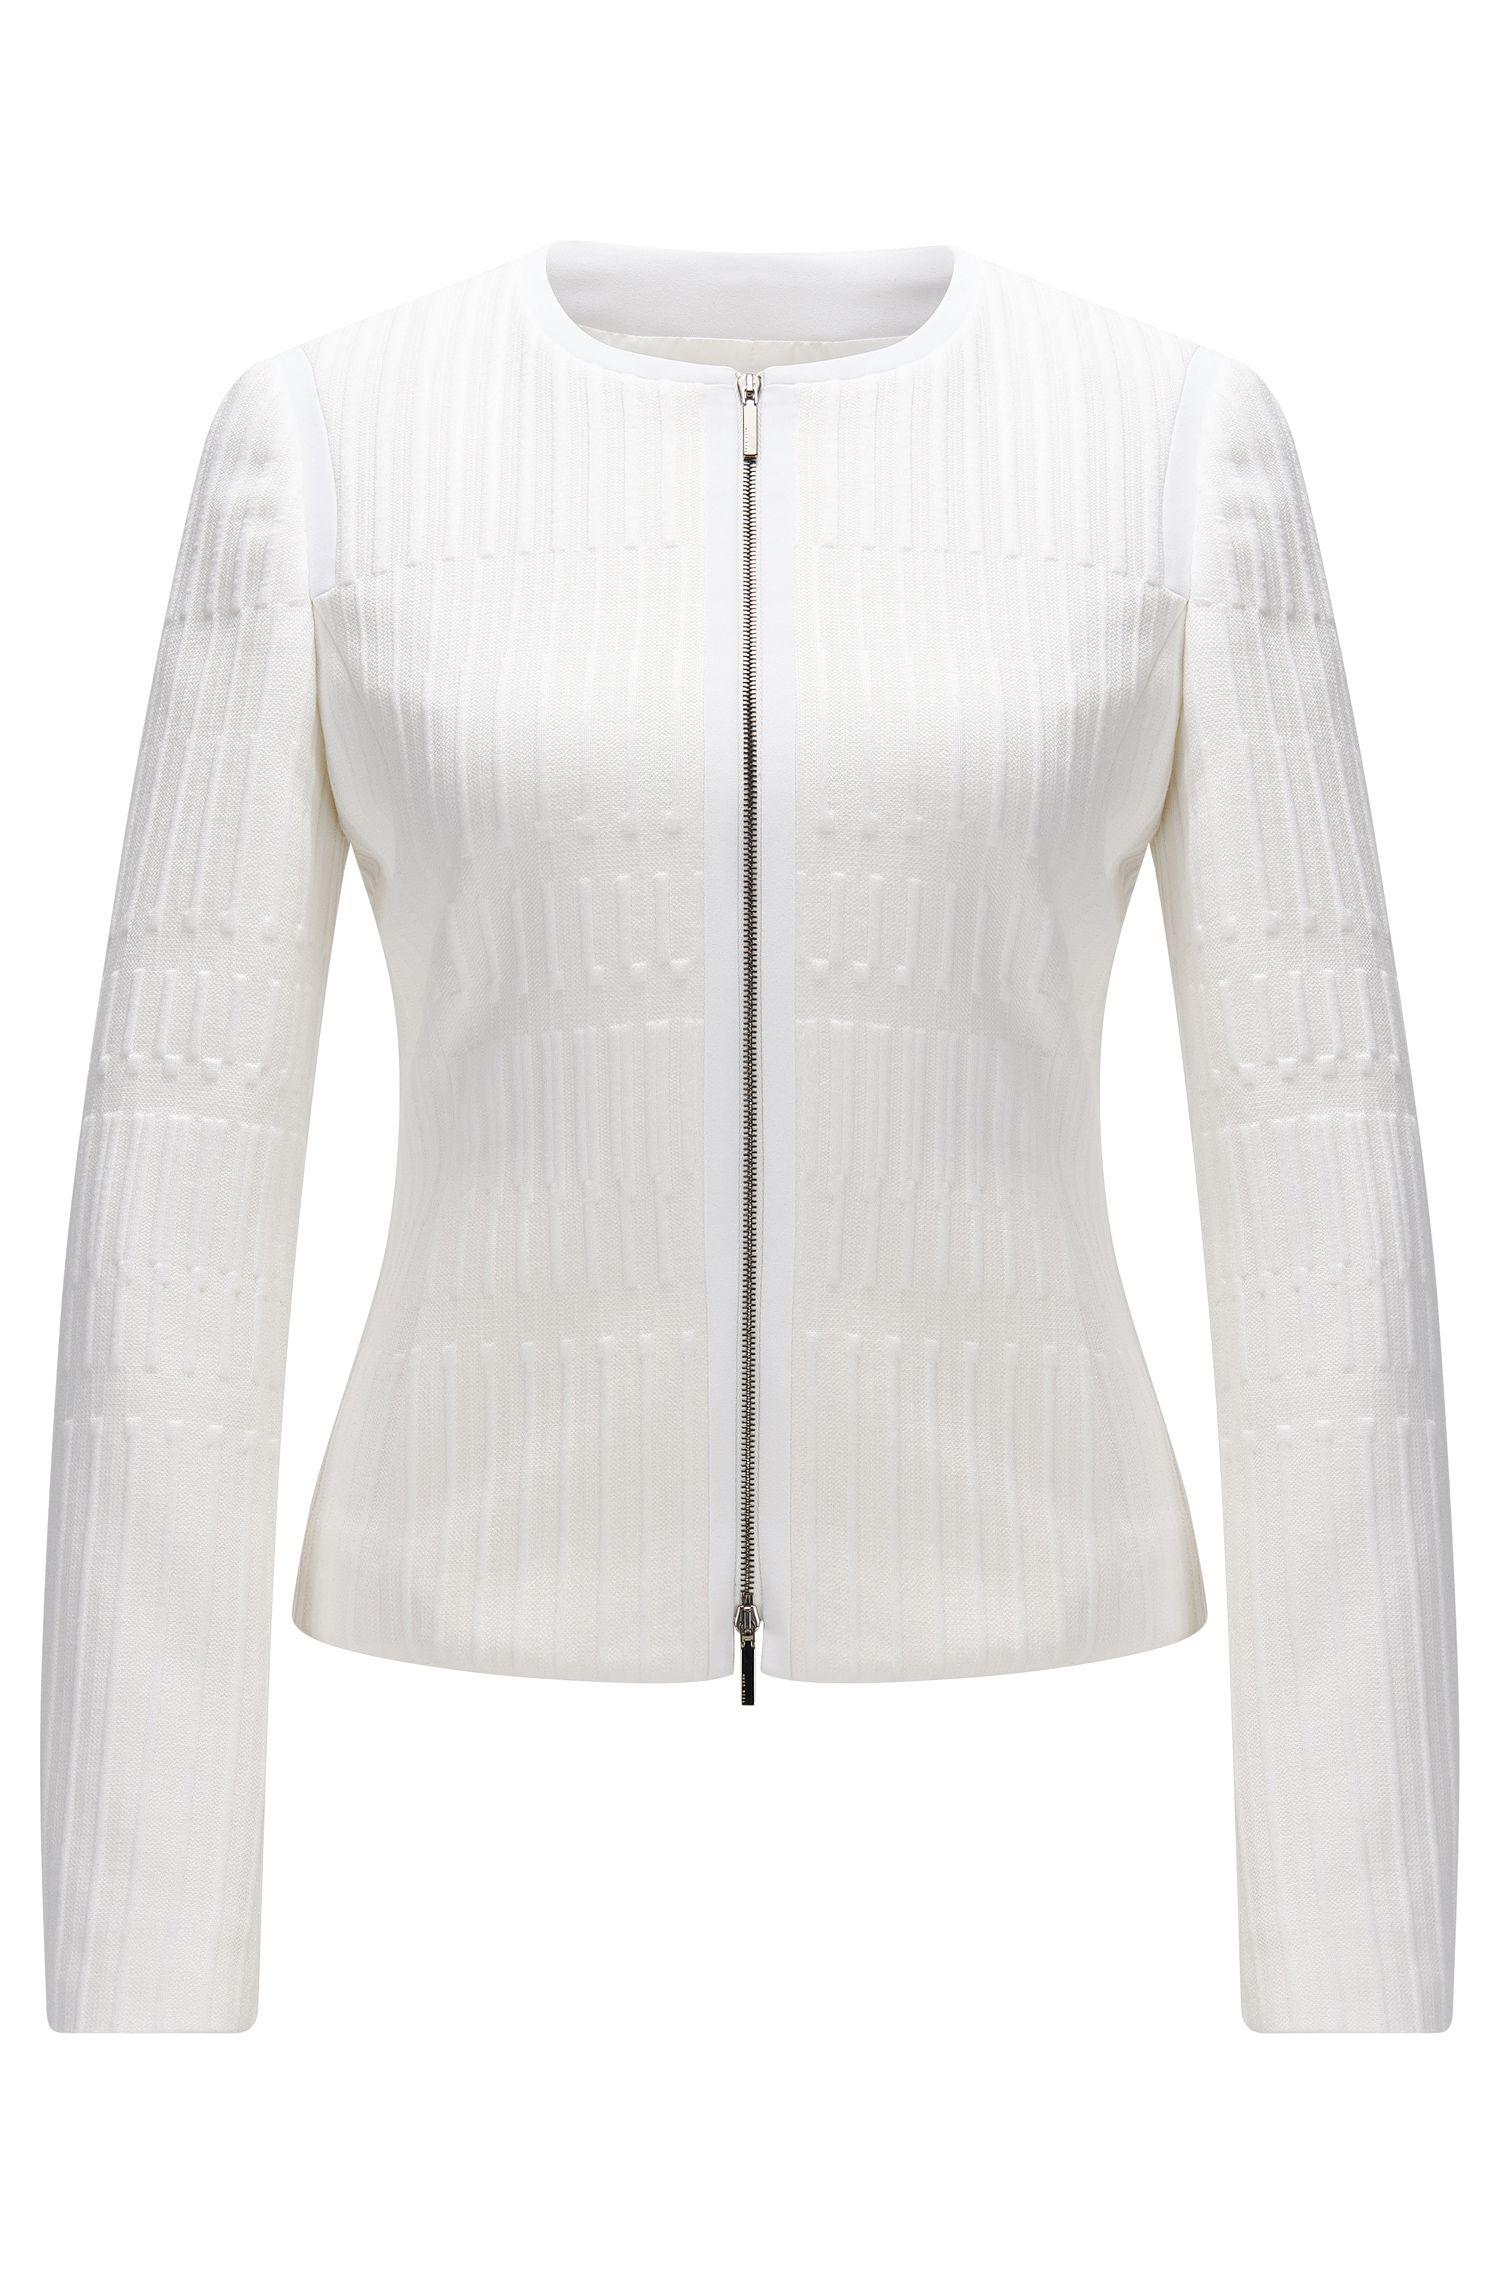 Giacca regular fit con zip integrale in jersey jacquard lavorato